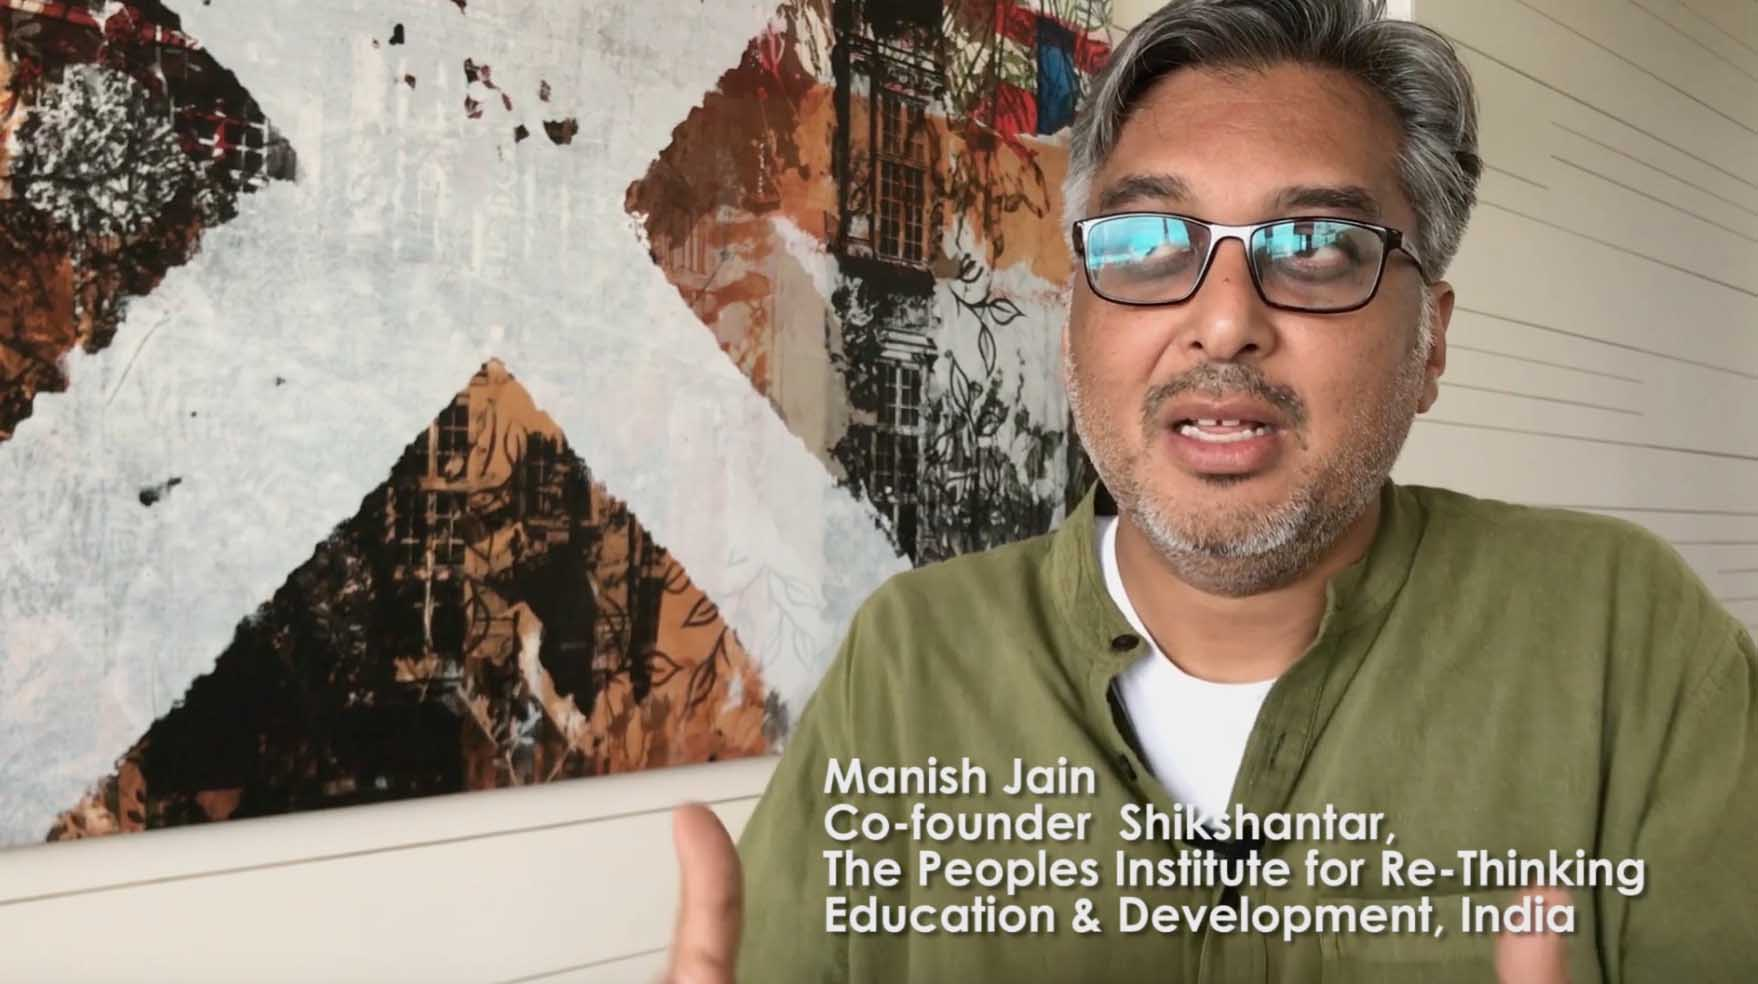 Manish Jain, India